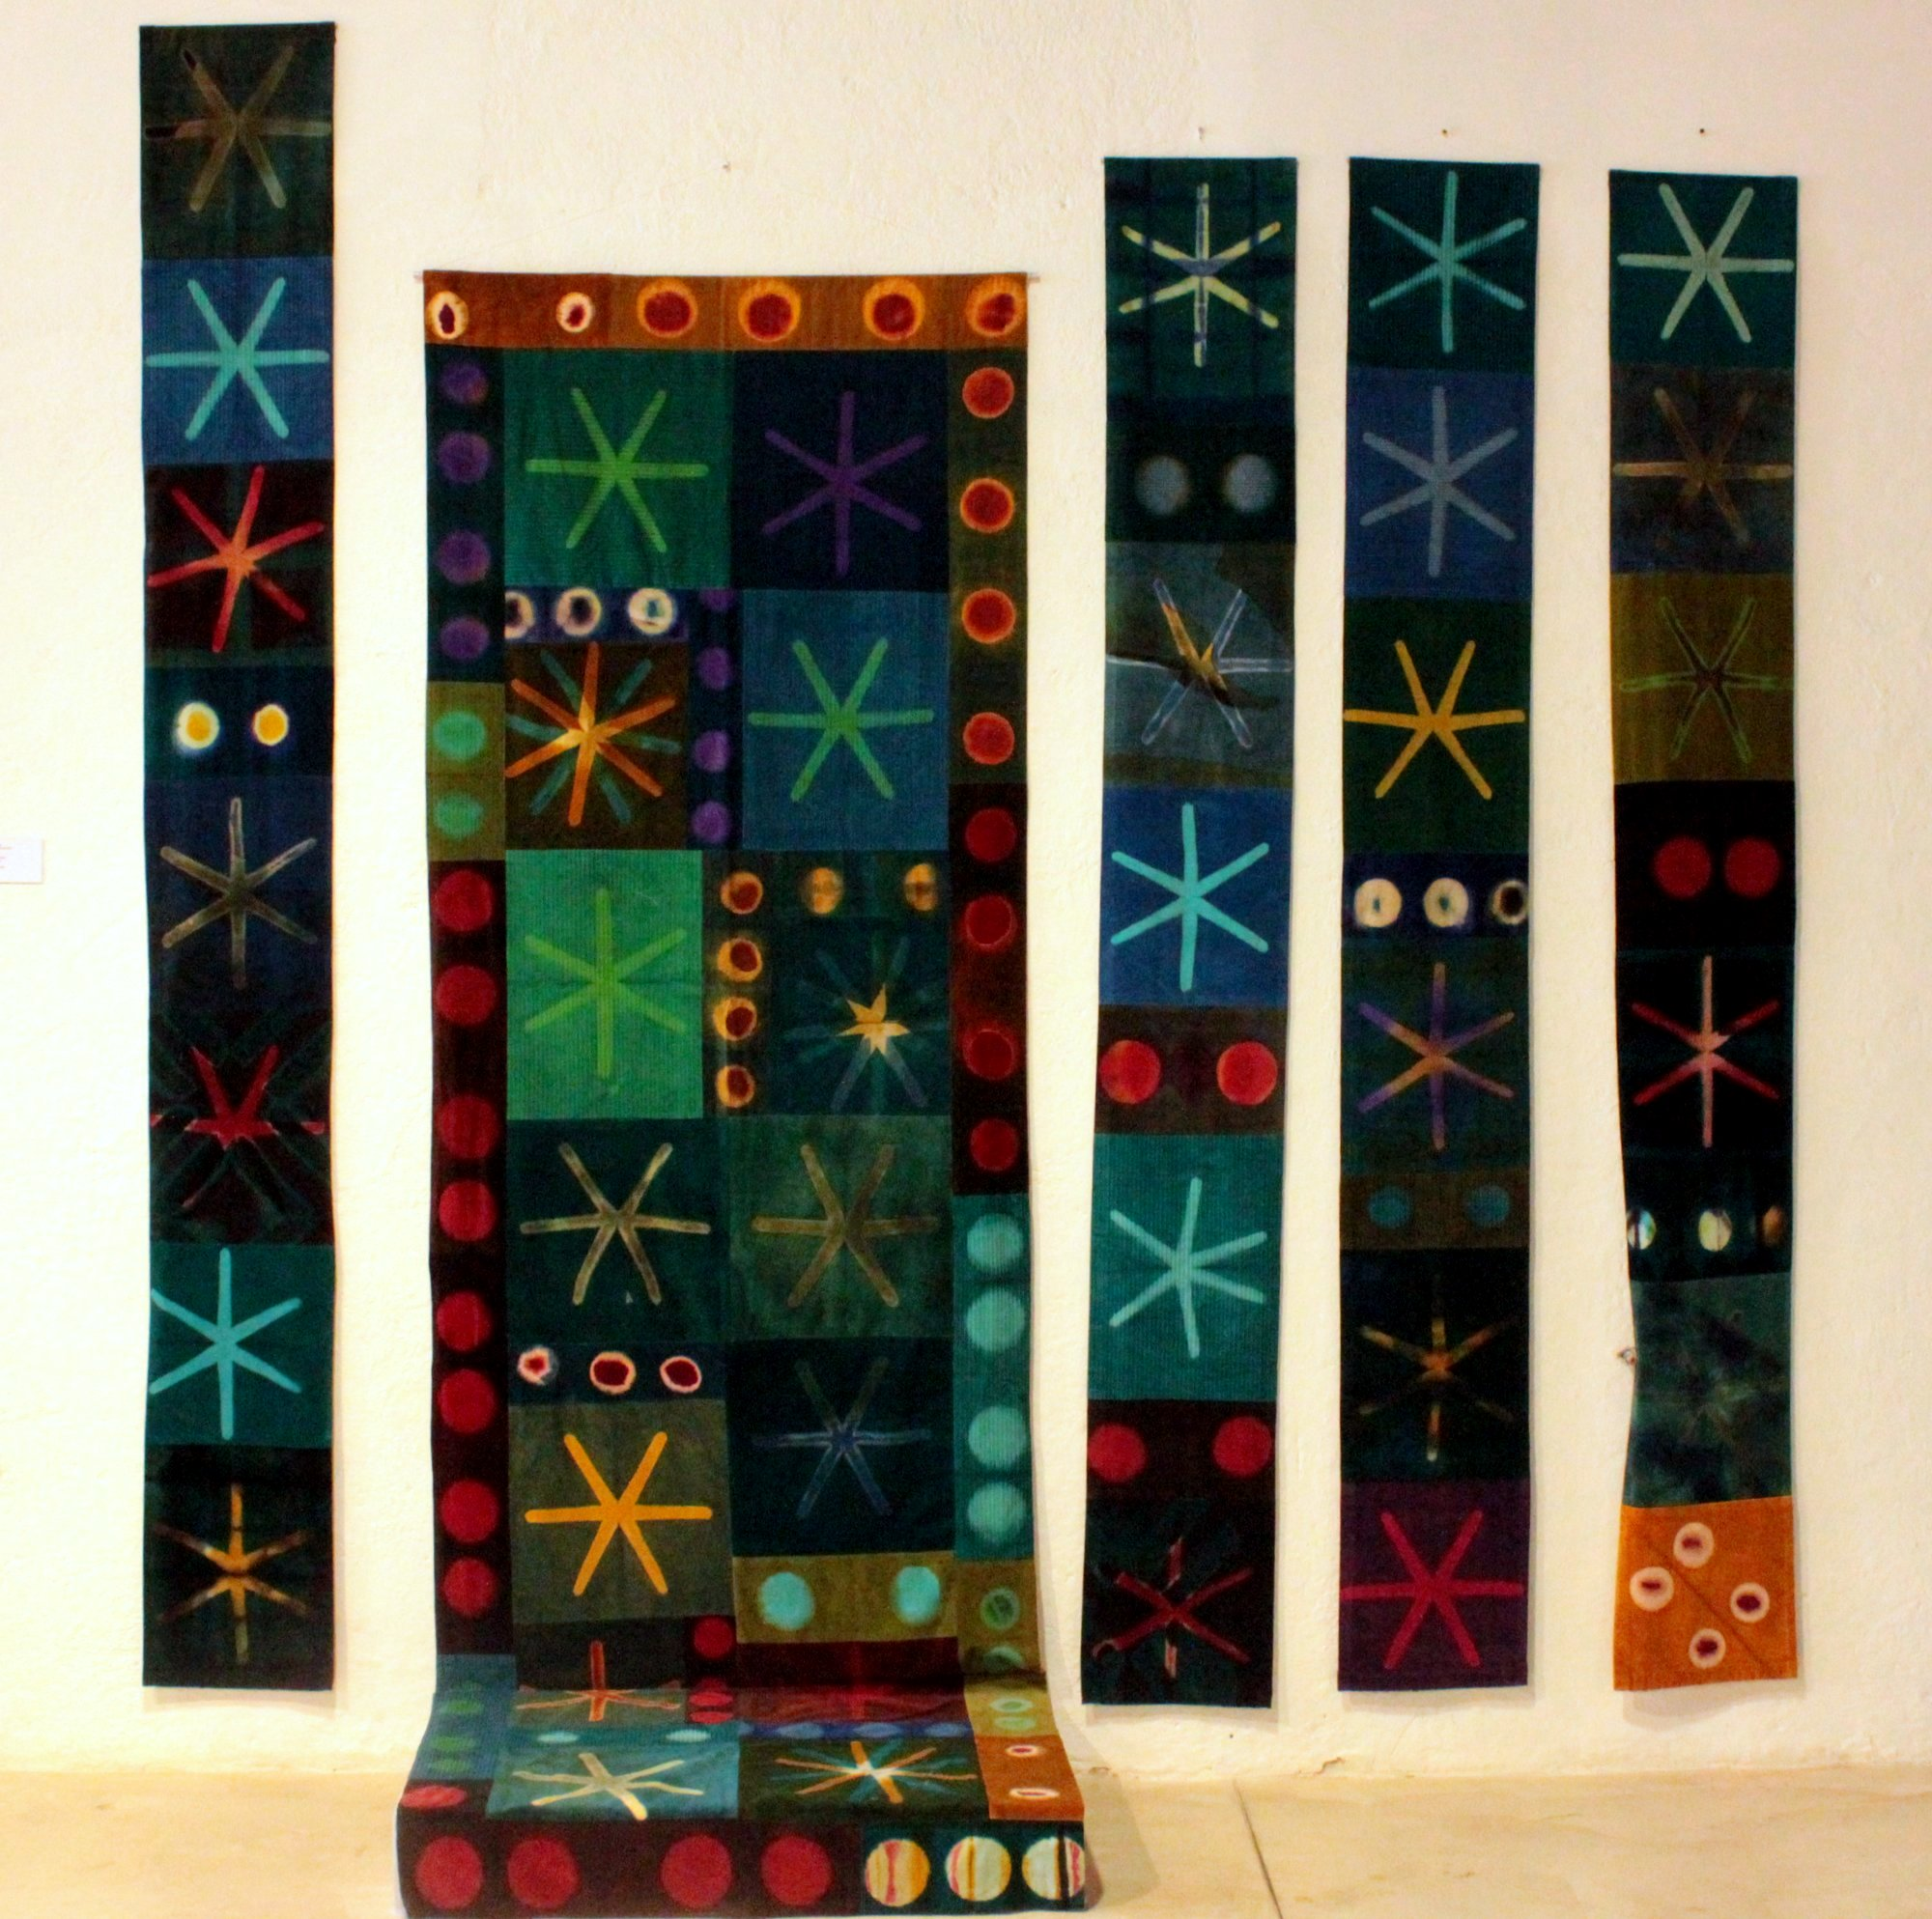 Dyework on velvet by a Swedish artist.